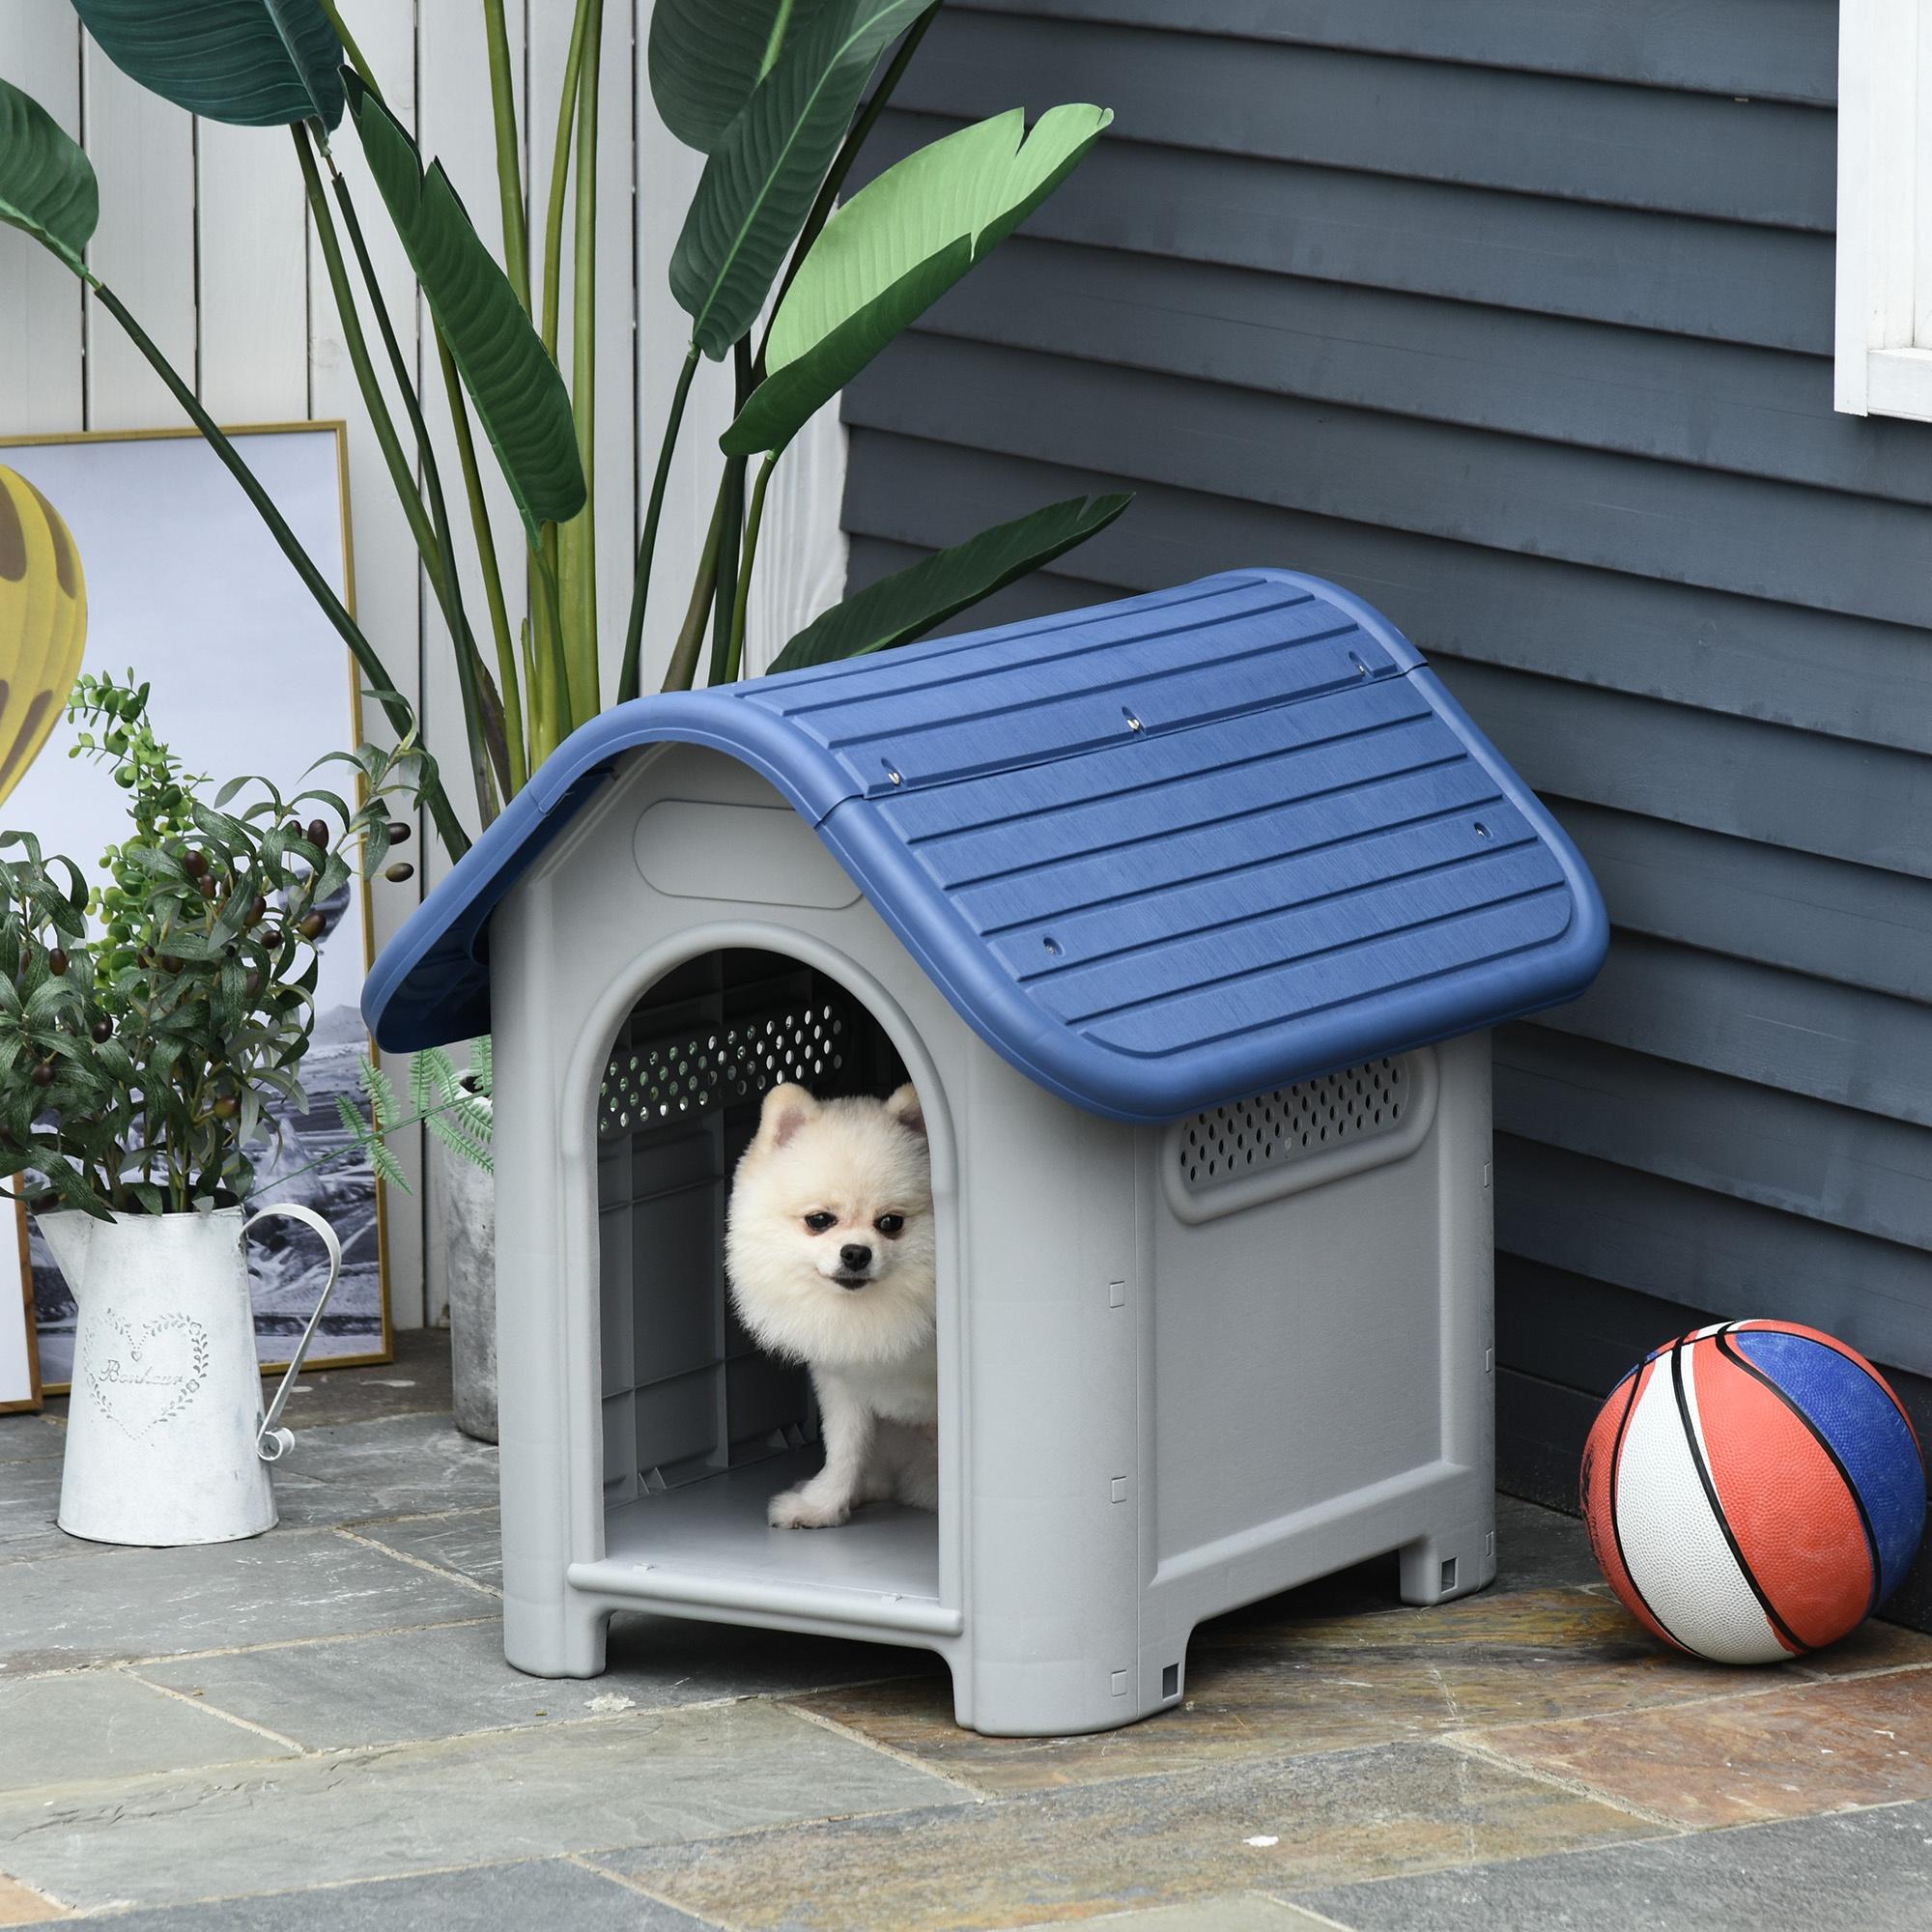 Caseta para perros pequeños con respiraderos